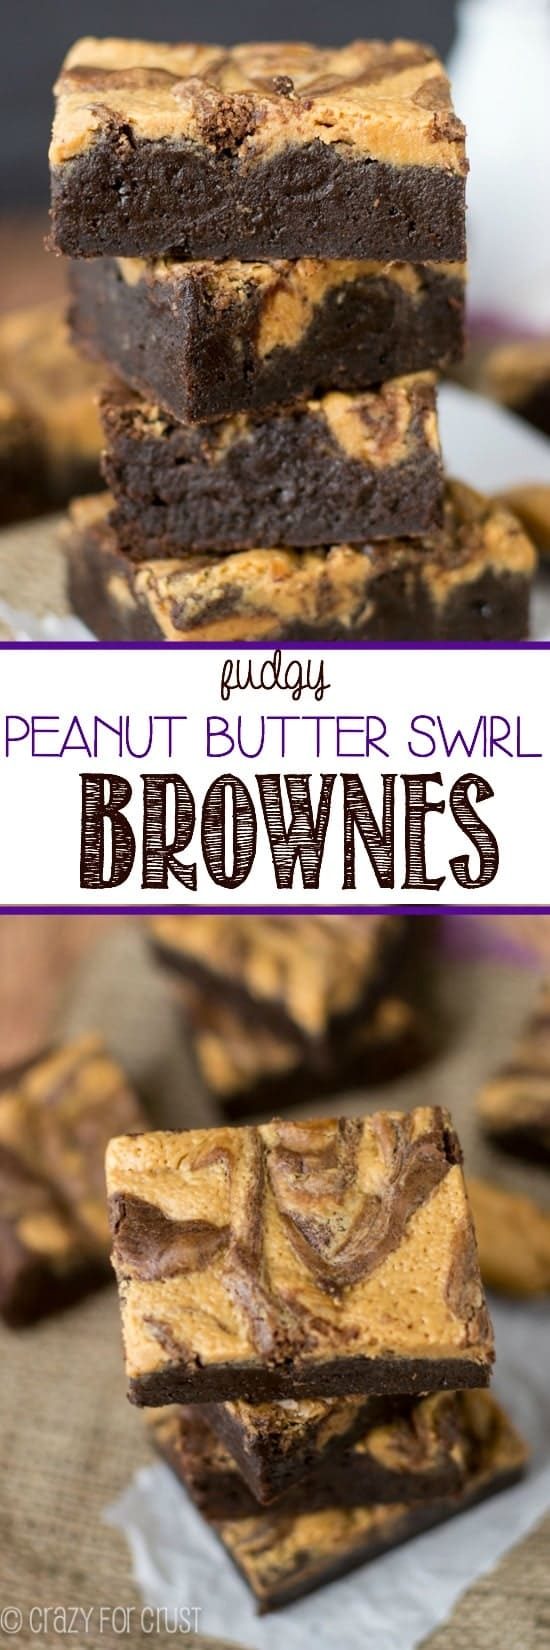 Fudgy Peanut Butter Swirl Brownies